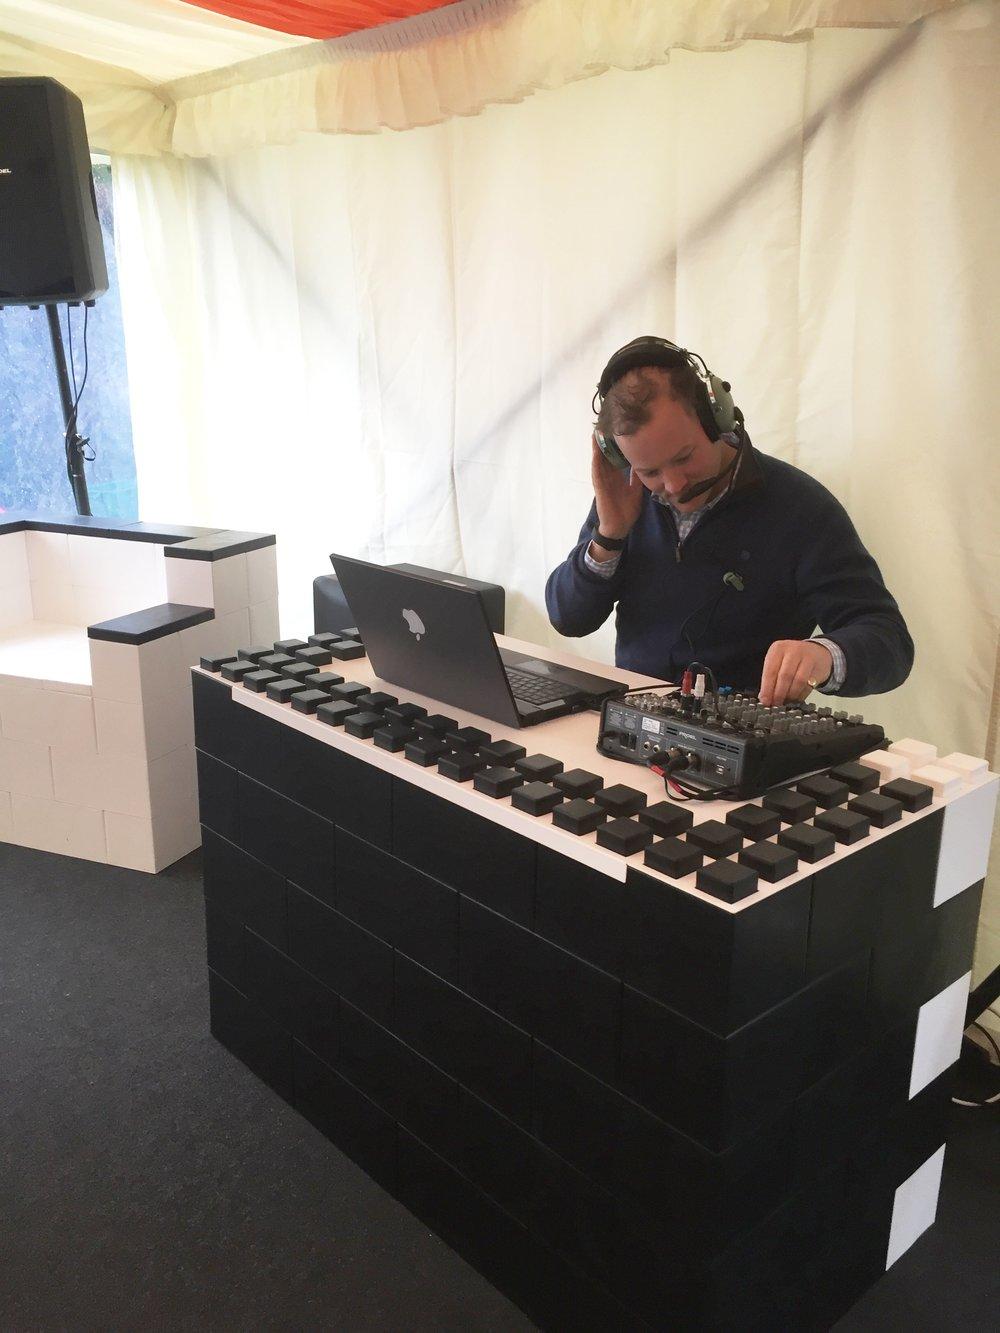 DJ Mixing.JPG